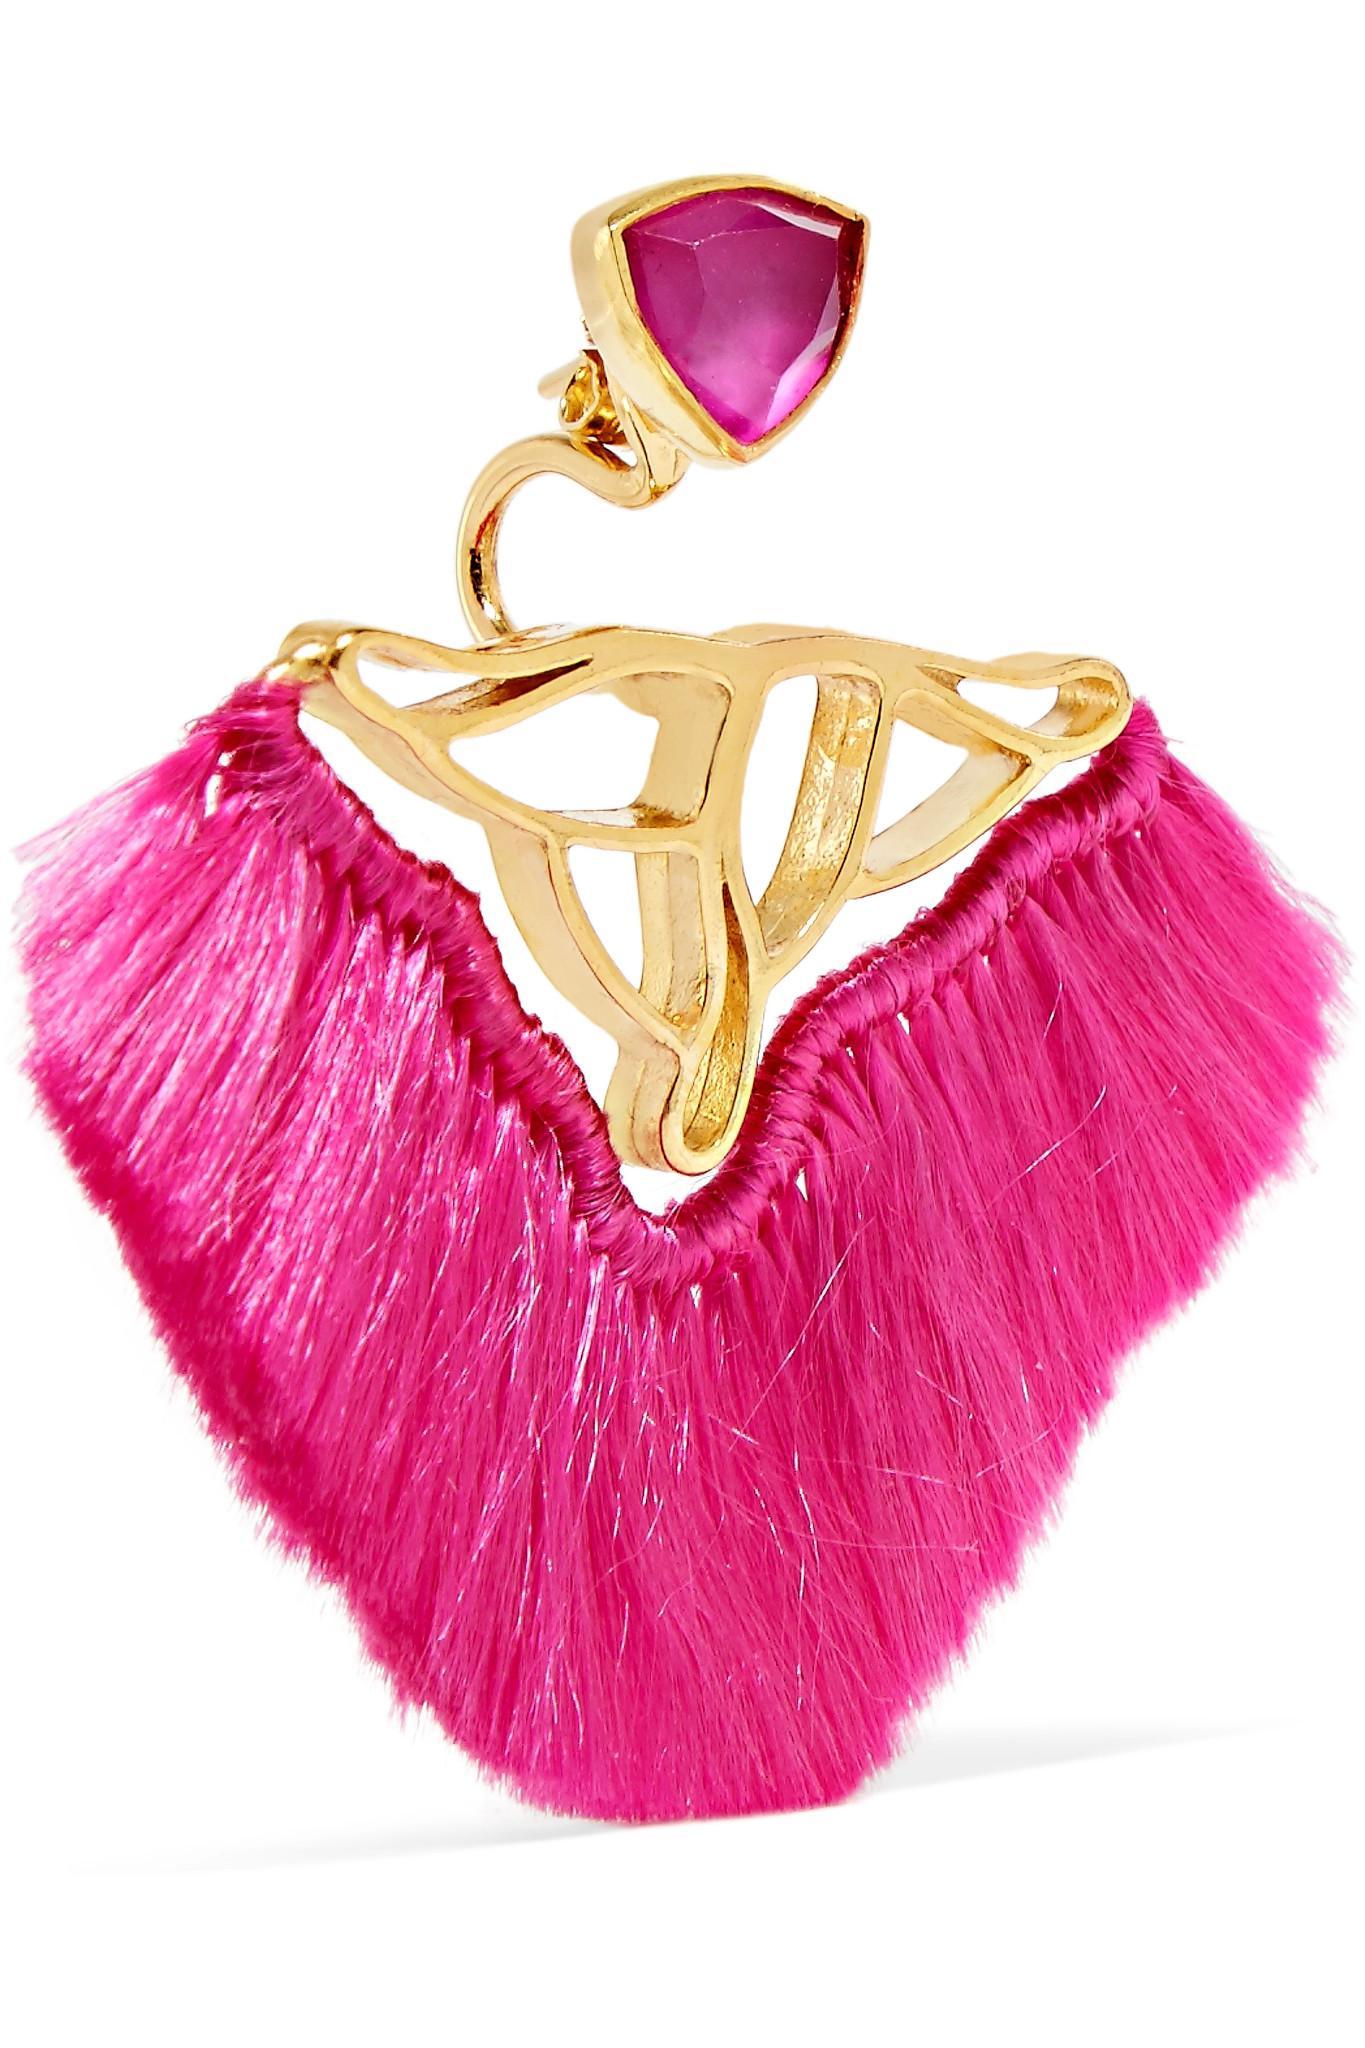 Fringed Gold Vermeil, Quartz And Faux Ruby Earrings - Pink Katerina Makriyianni